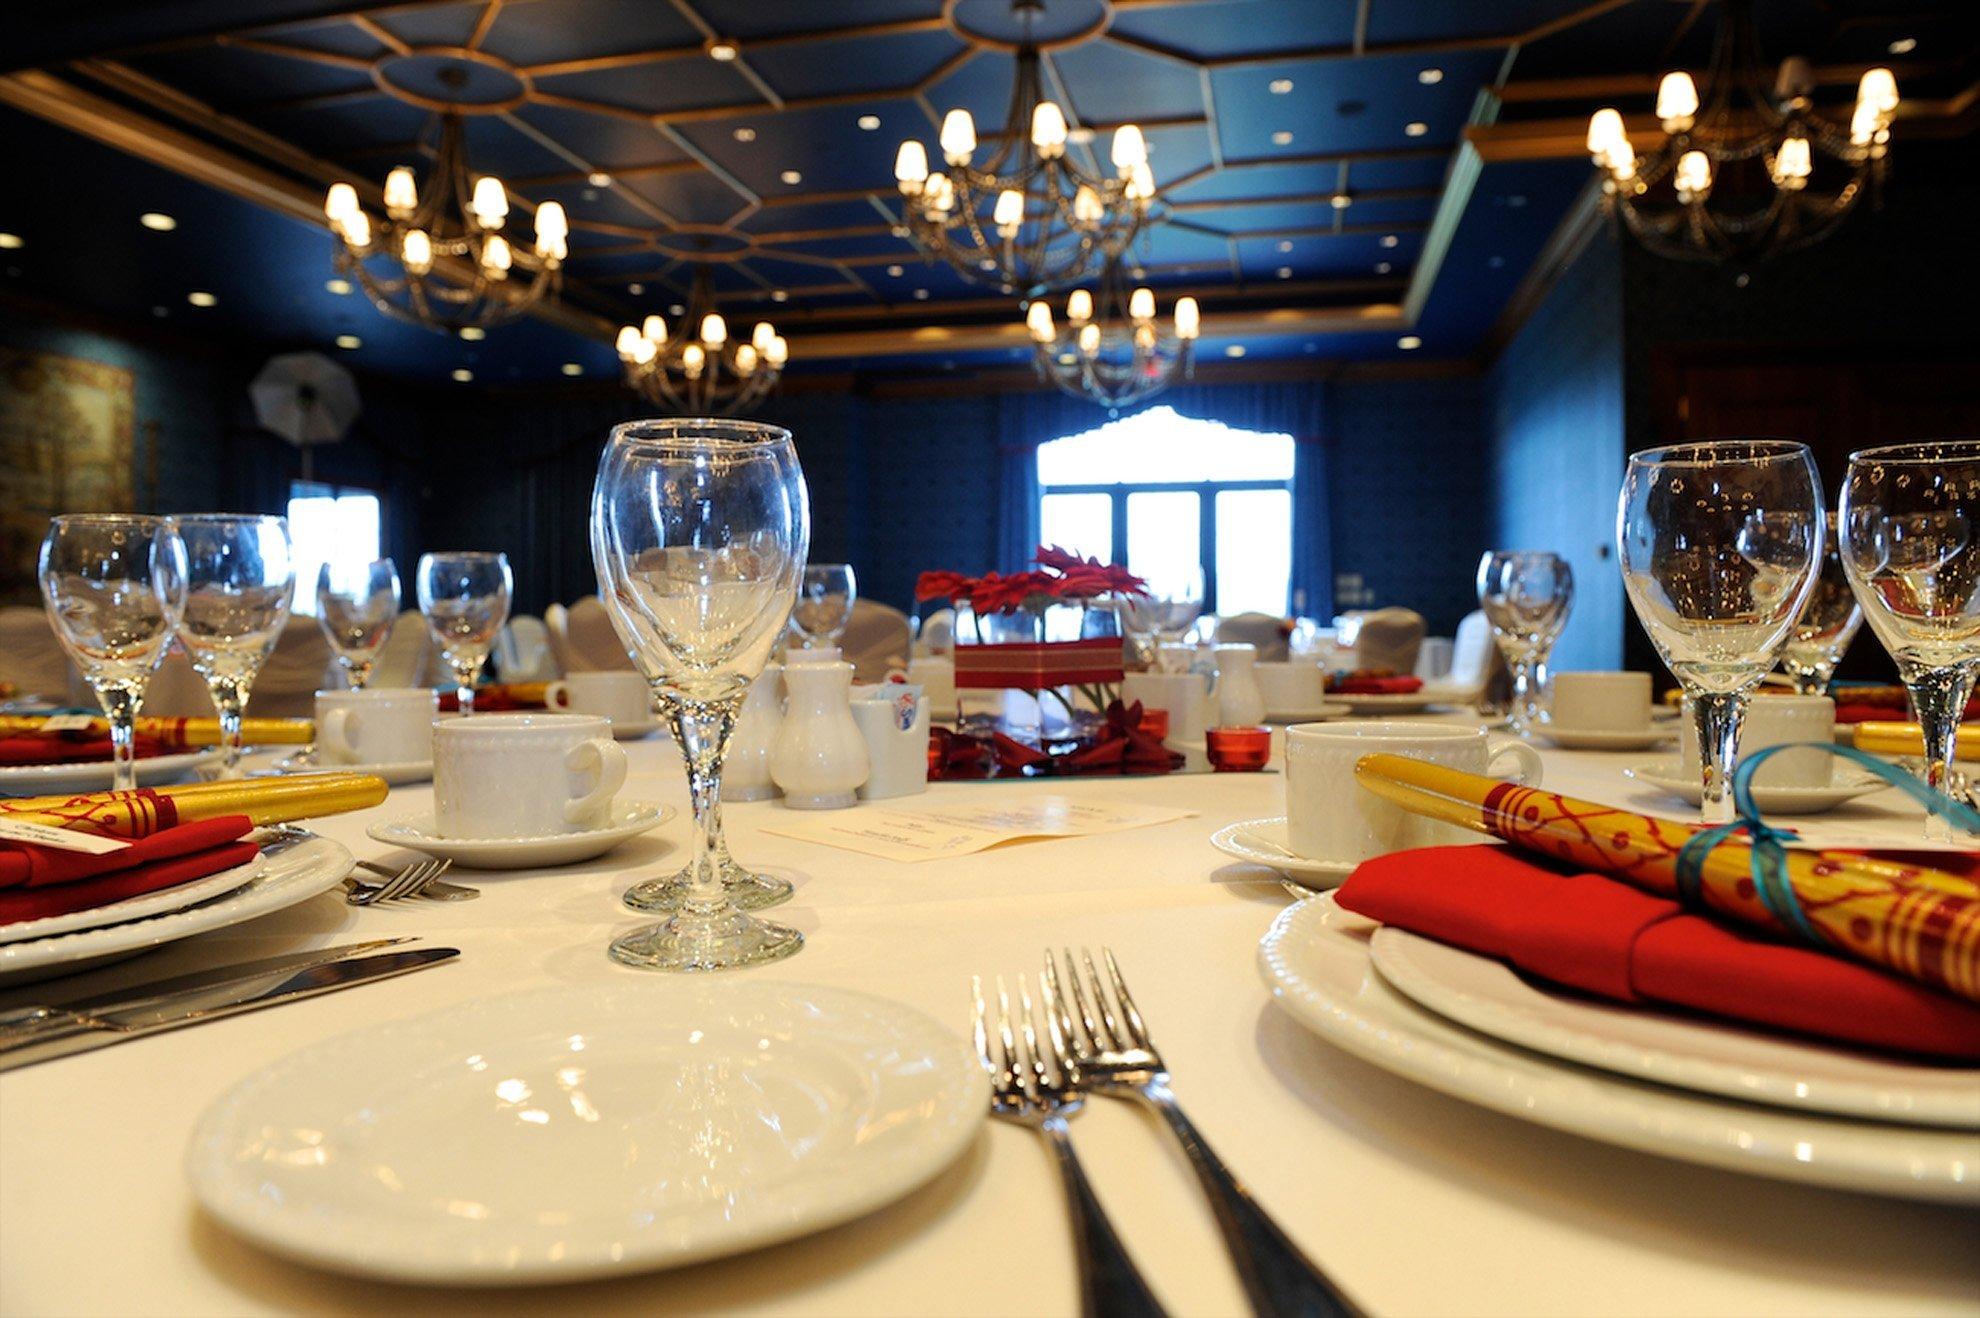 Glen Cairn reception venue